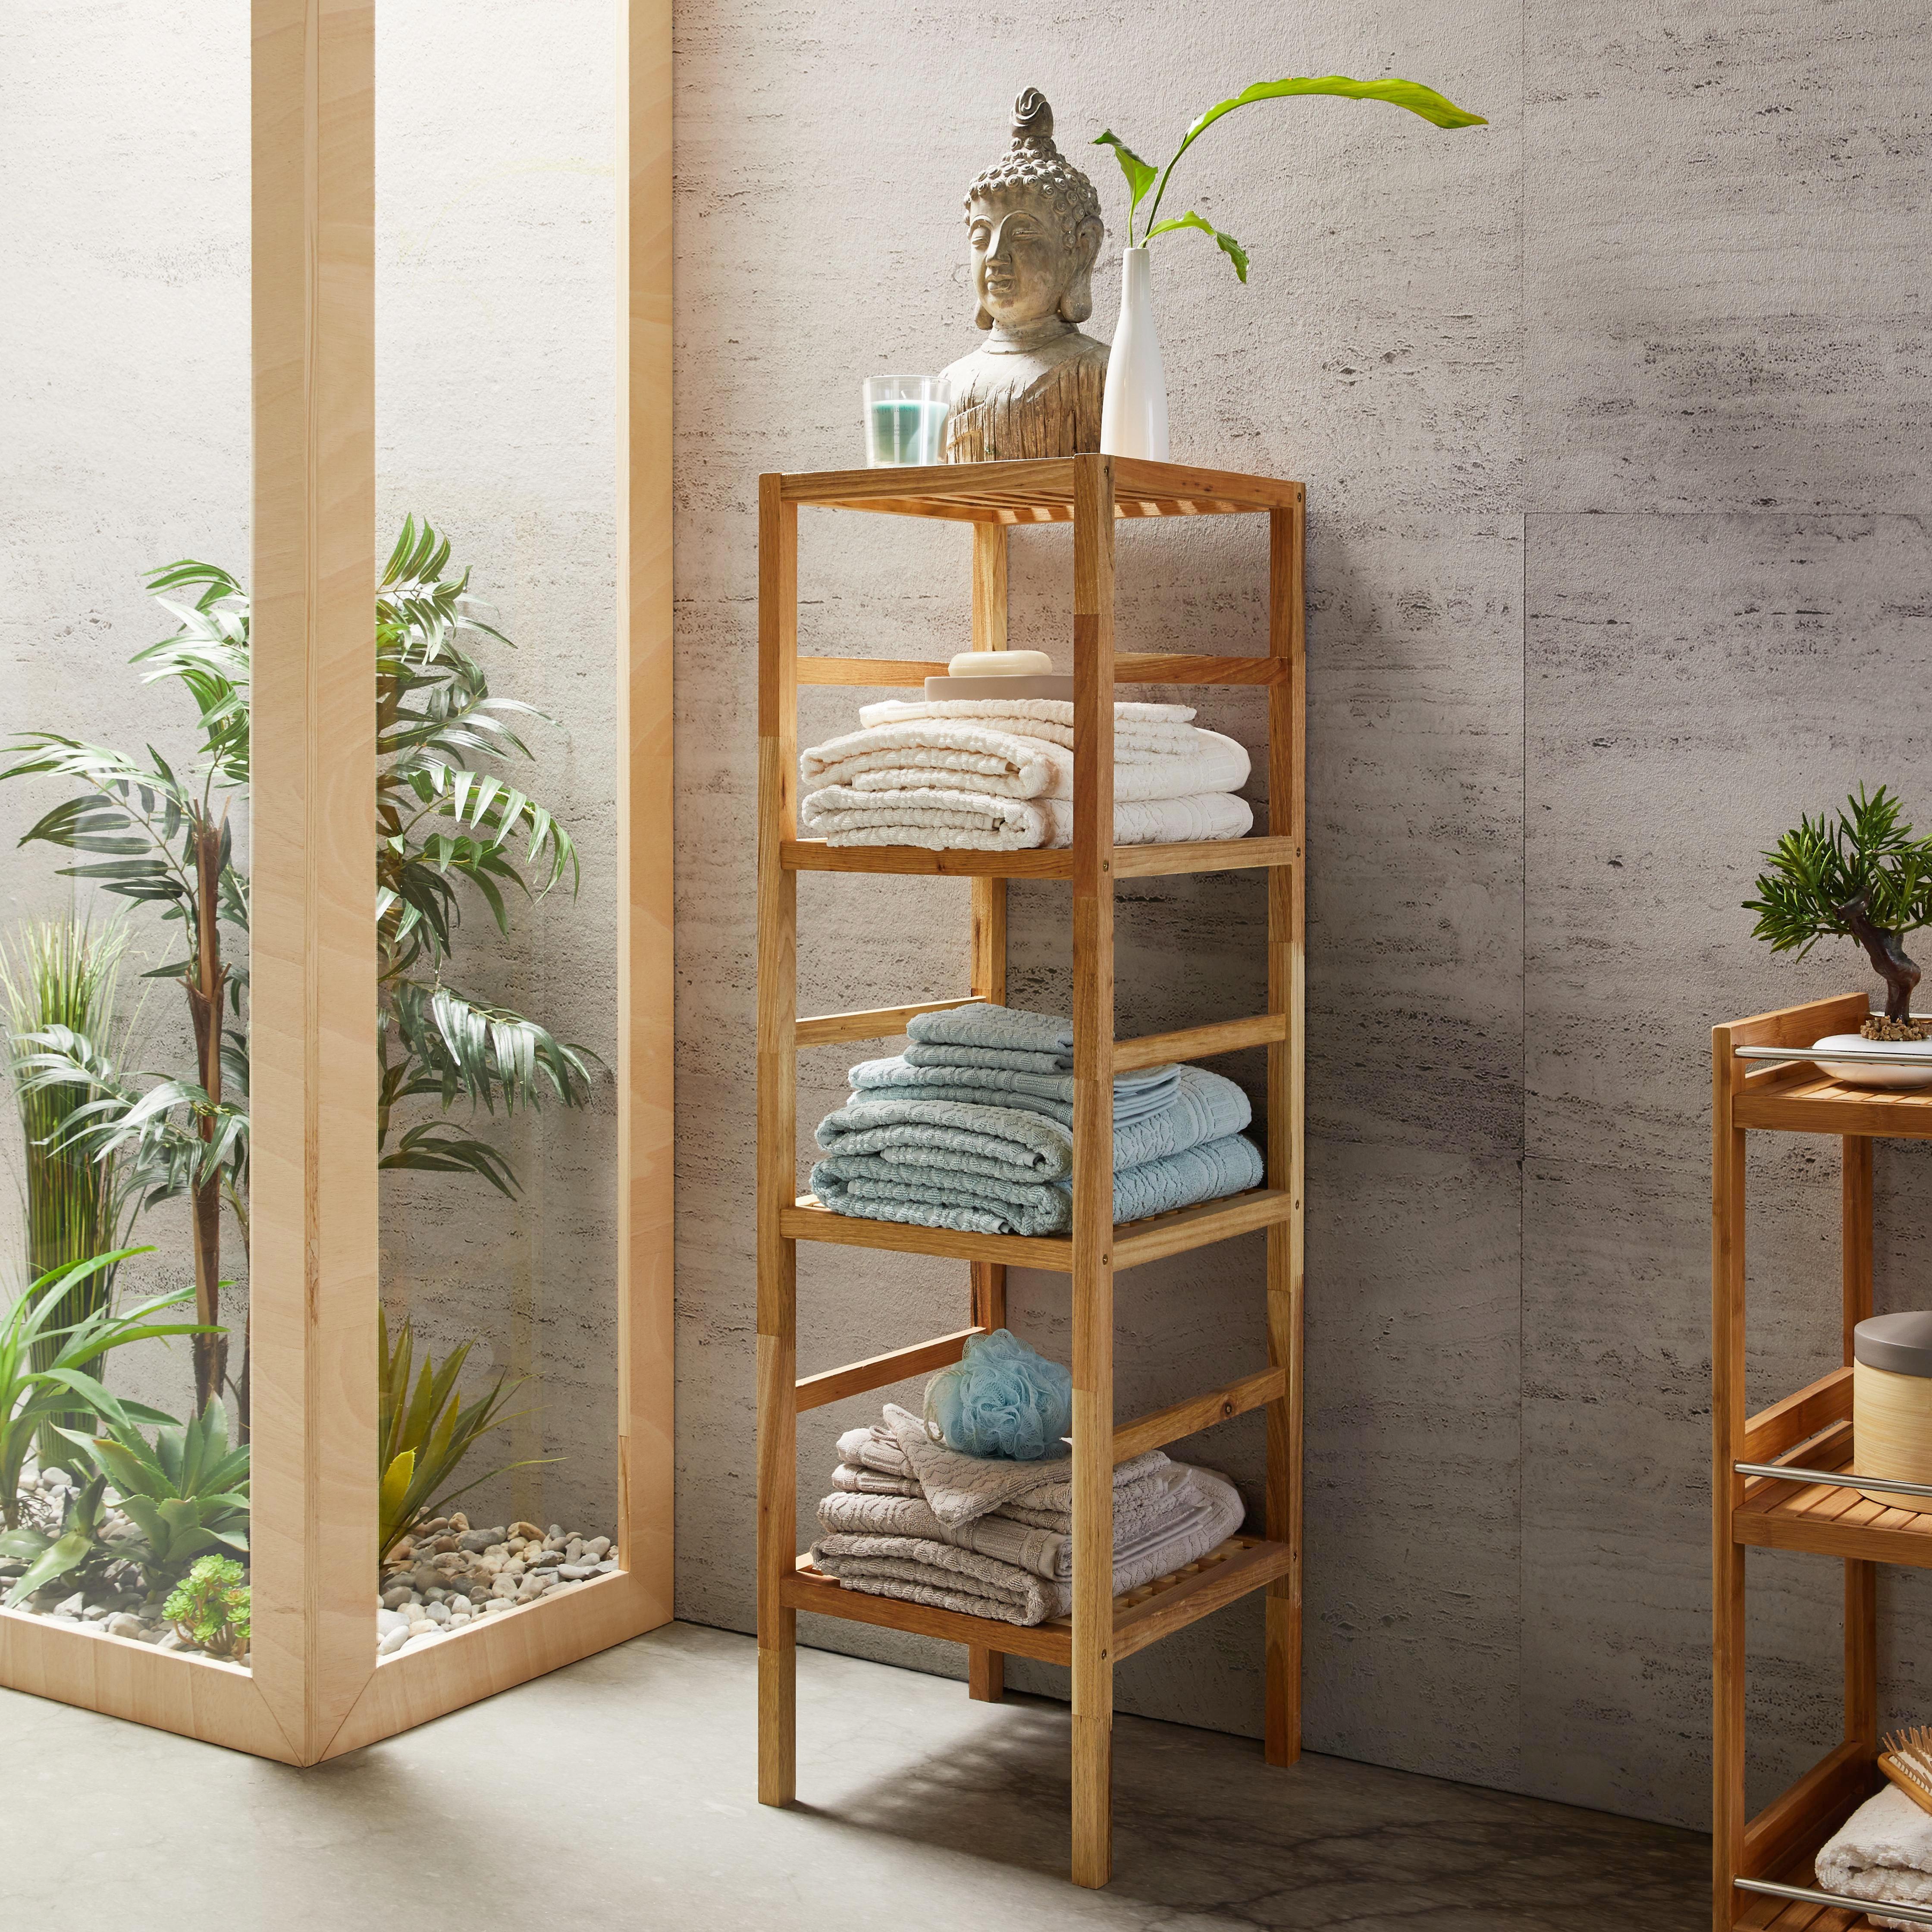 Handtuch Carina - Grün, ROMANTIK / LANDHAUS, Textil (50/100cm) - MÖMAX modern living